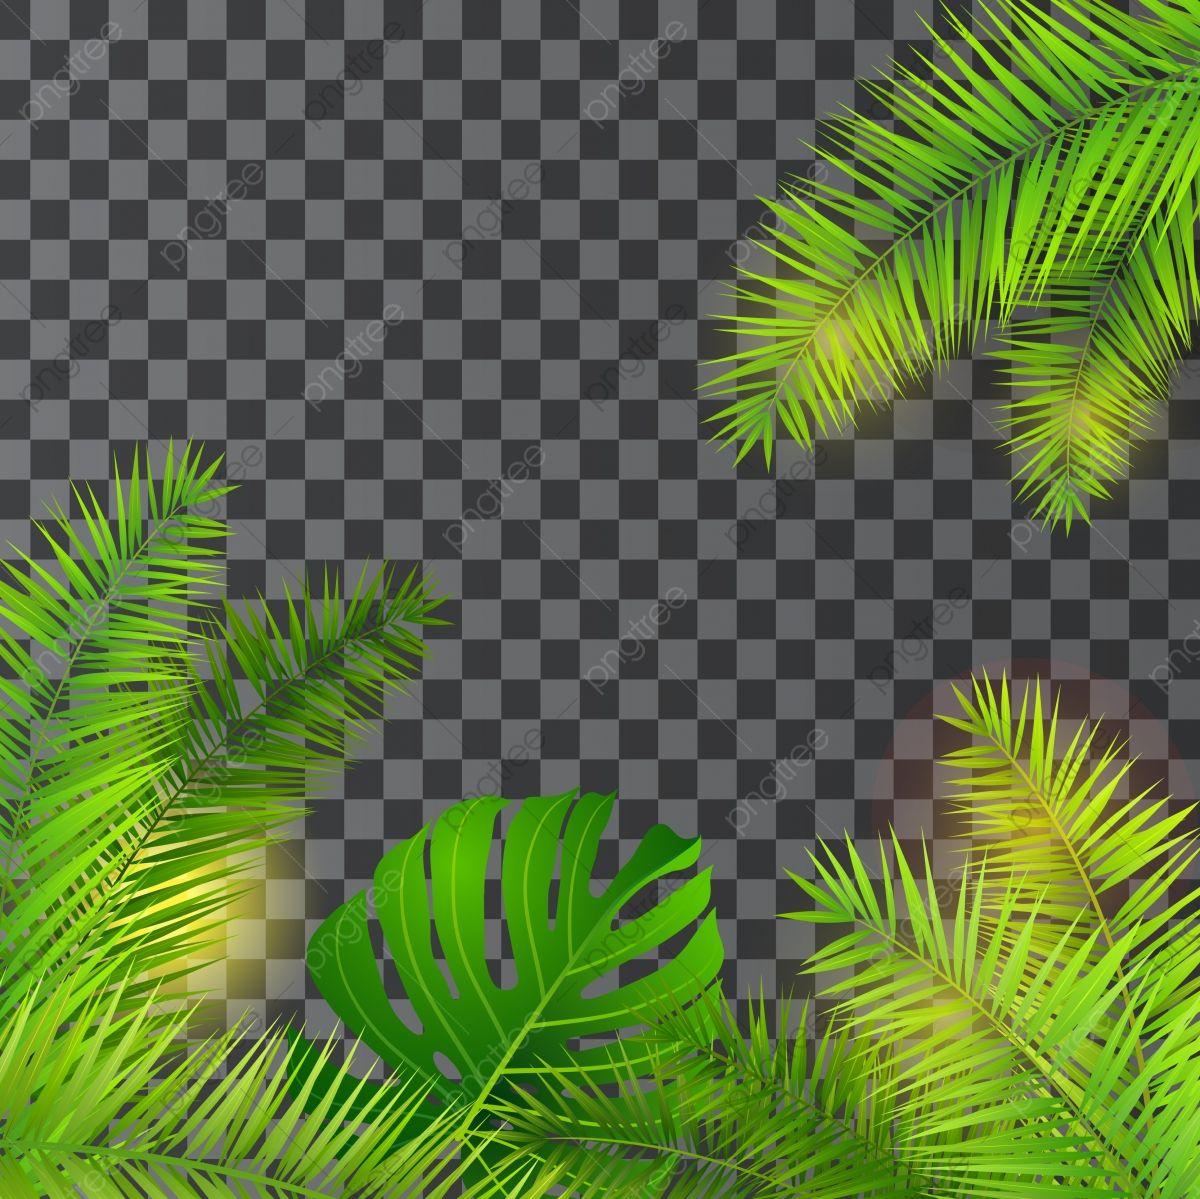 Brown Flower Pot Green Leaves Plantain Leaf Plant Cartoon Illustration Plant Clipart Hand Drawn Potted Illustration Beautiful Potted Plant Png Transparent Cl Poster Bunga Lukisan Kaktus Lukisan Bunga